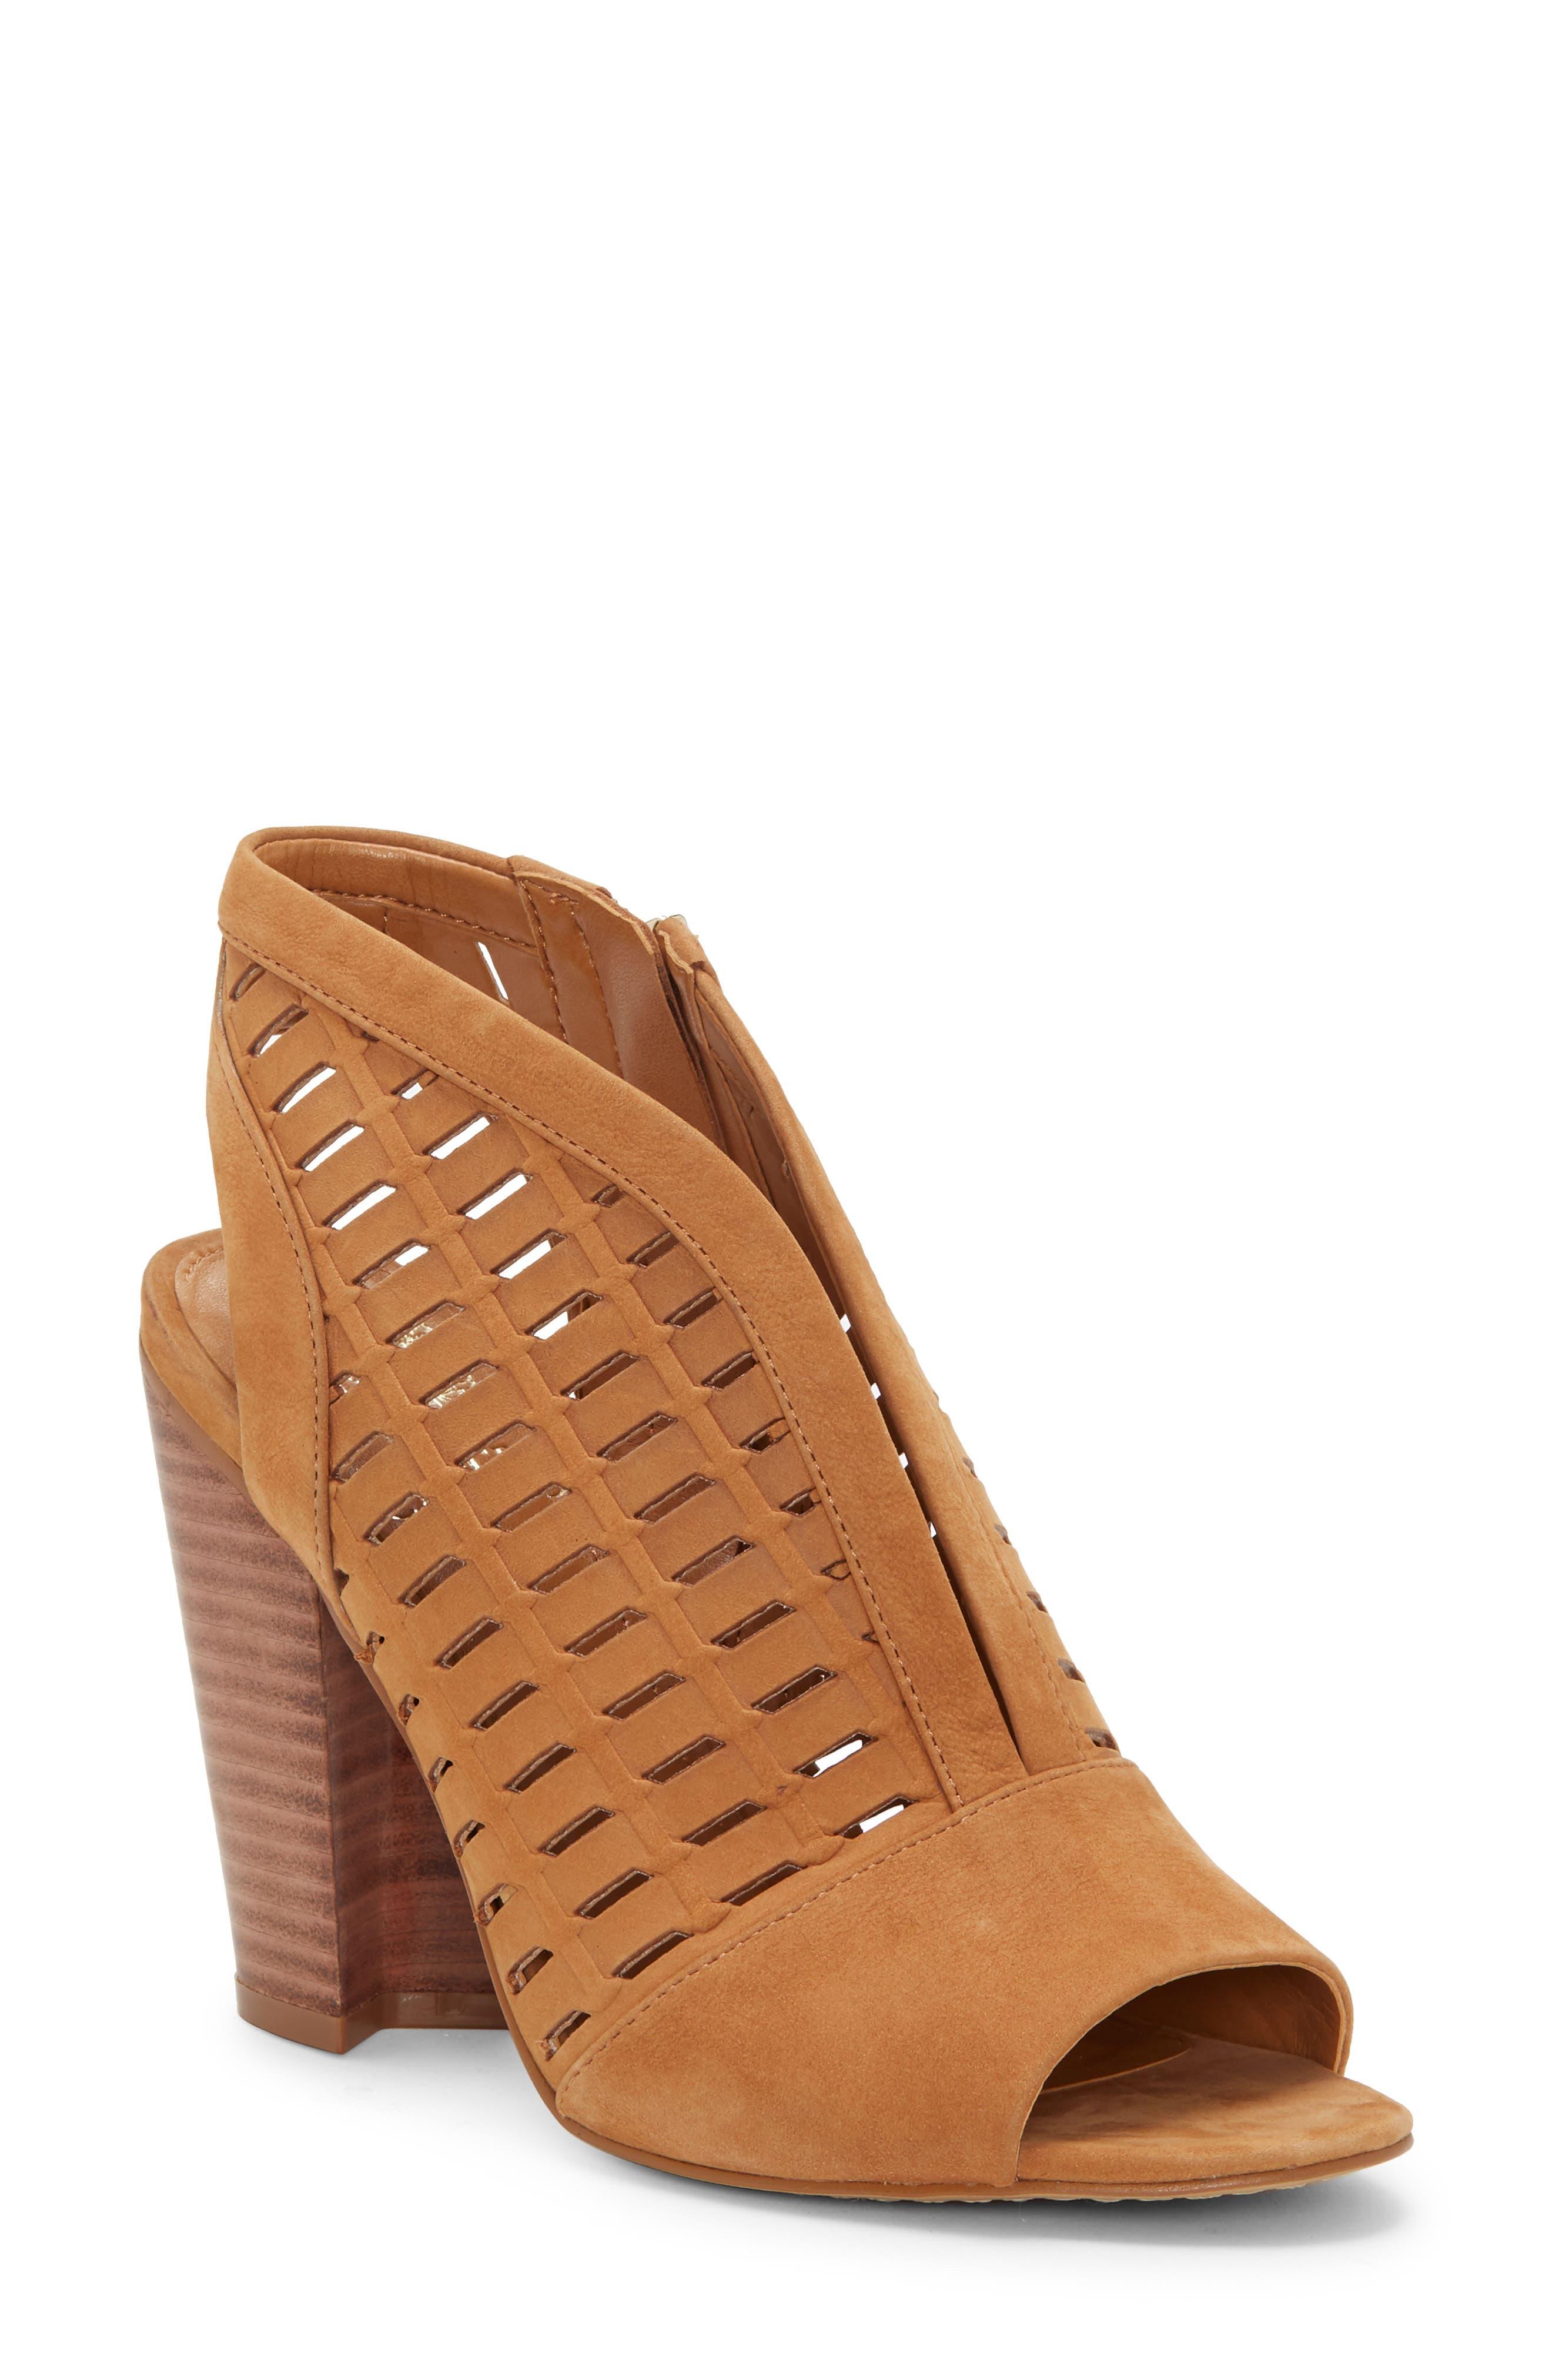 Image of Vince Camuto Korsta Suede Perforated Block Heel Sandal